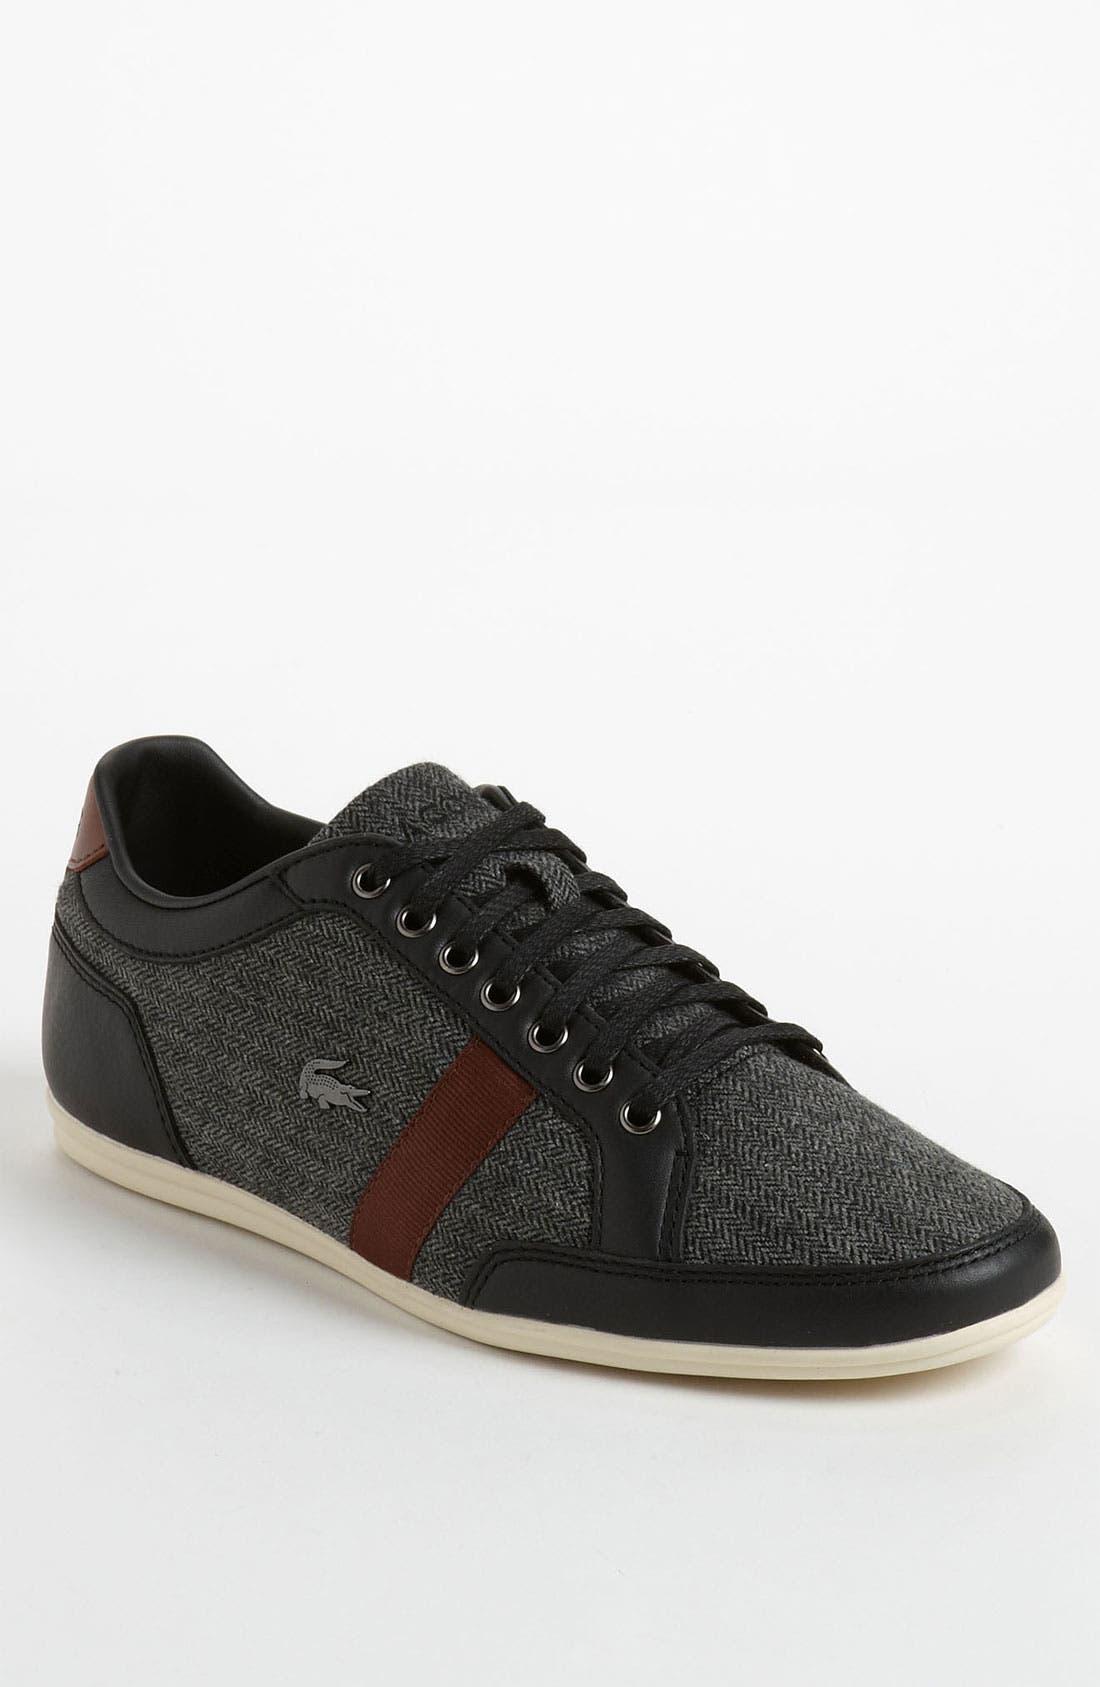 Alternate Image 1 Selected - Lacoste 'Alisos 7' Sneaker